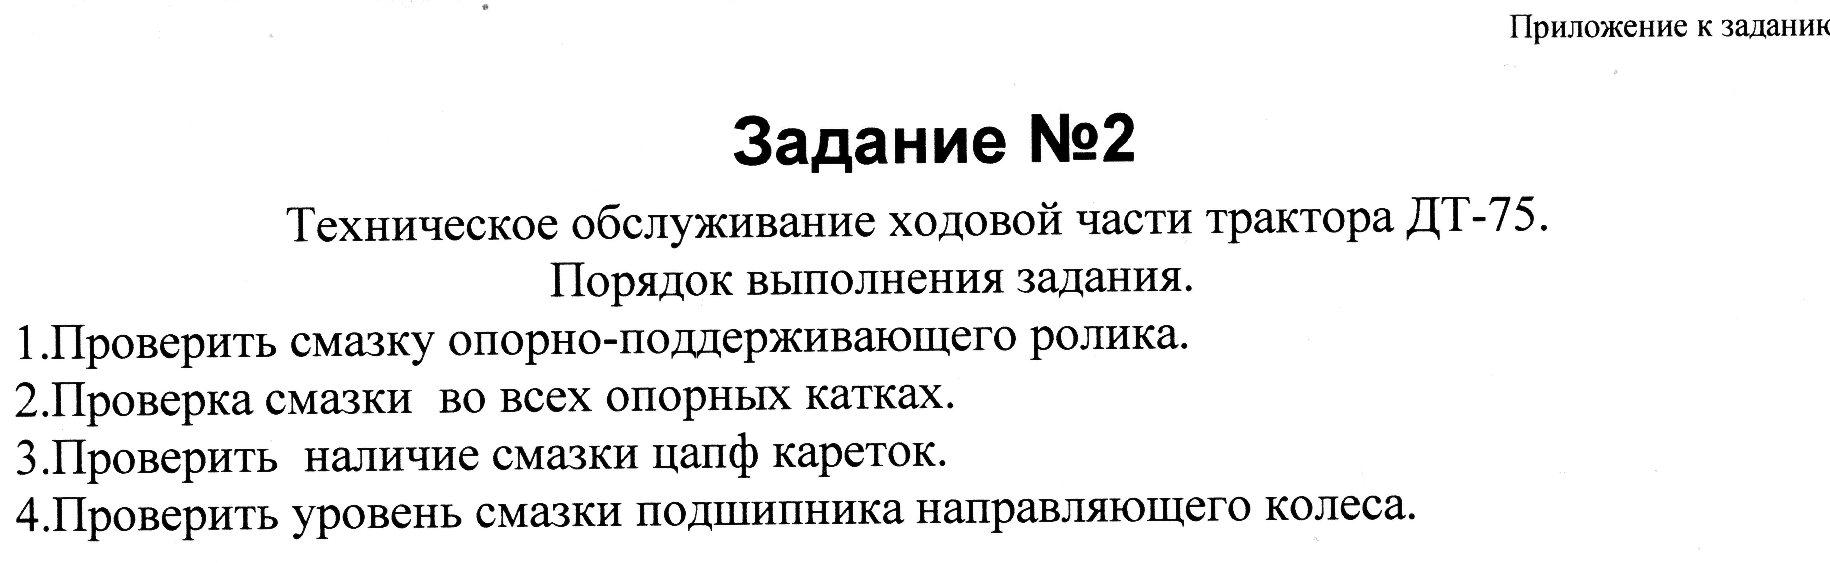 C:\Users\Василий Мельченко\Pictures\img570.jpg